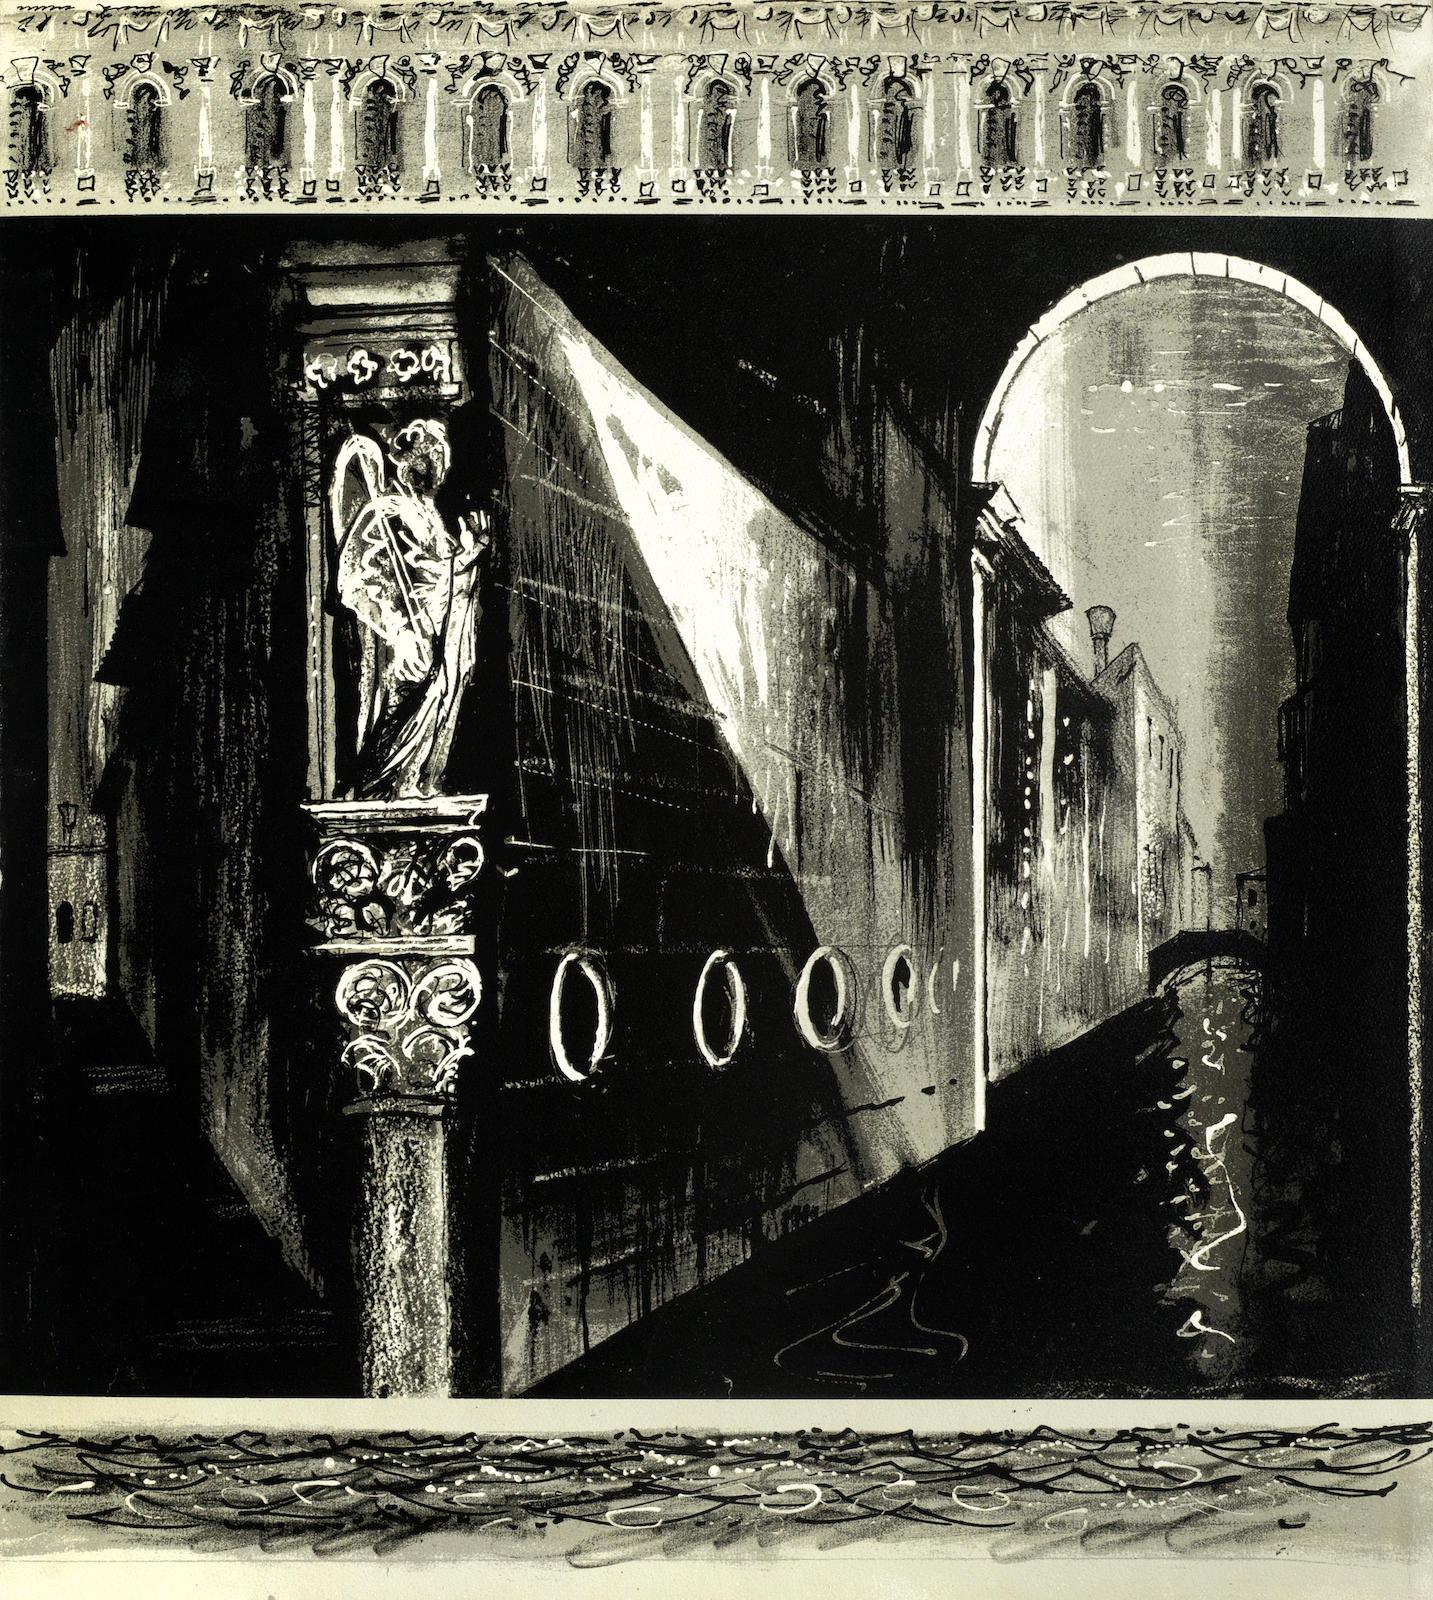 John Piper-Death in Venice: Side Panel Left & Side Panel Right folio-1973